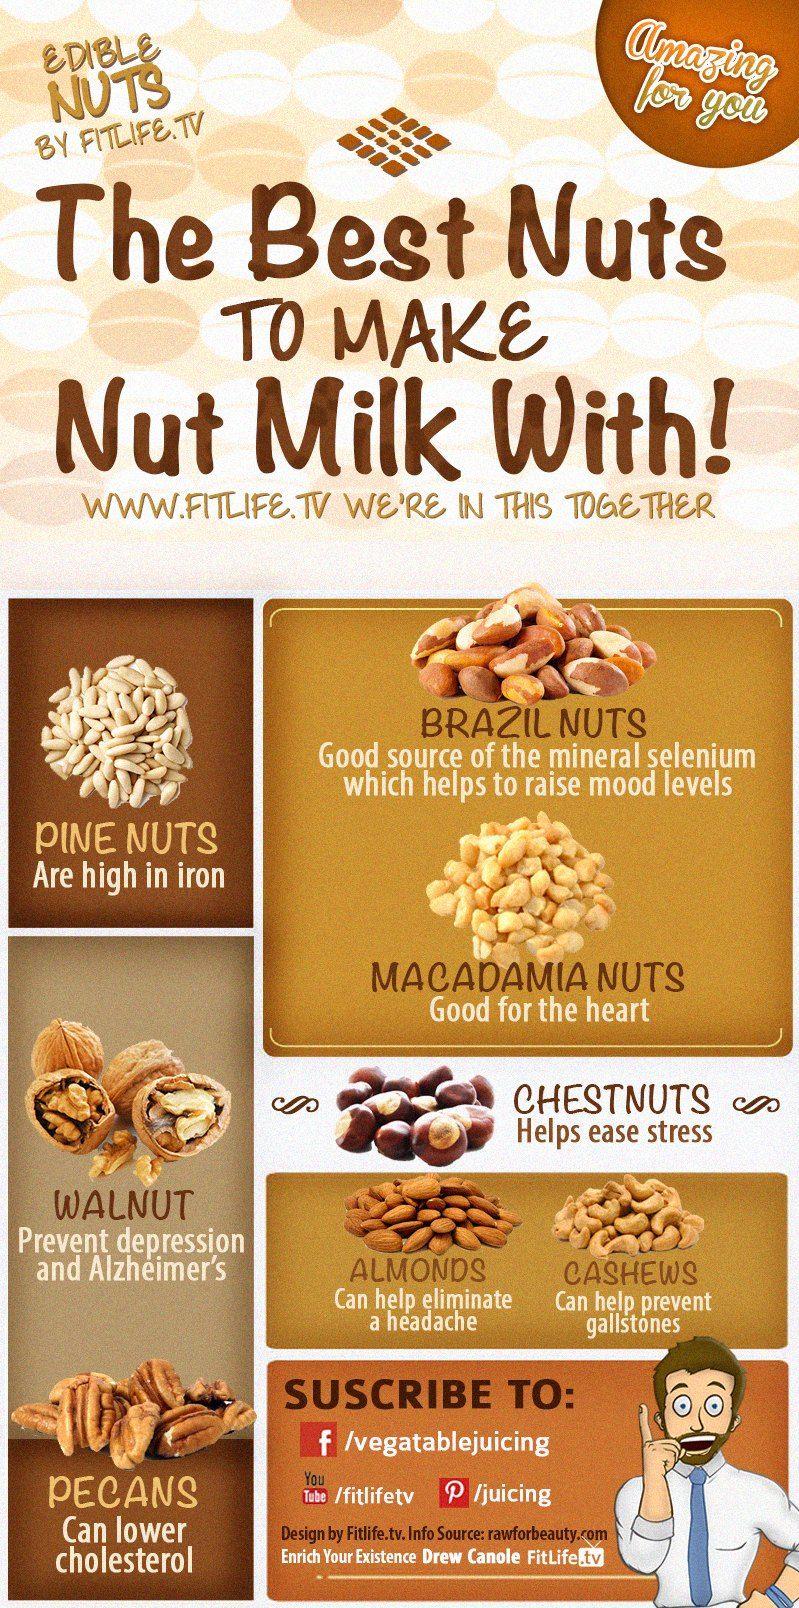 How To Make Nut Milk Best Nuts To Use Nut Milk Nut Milk Recipe Homemade Nut Milk